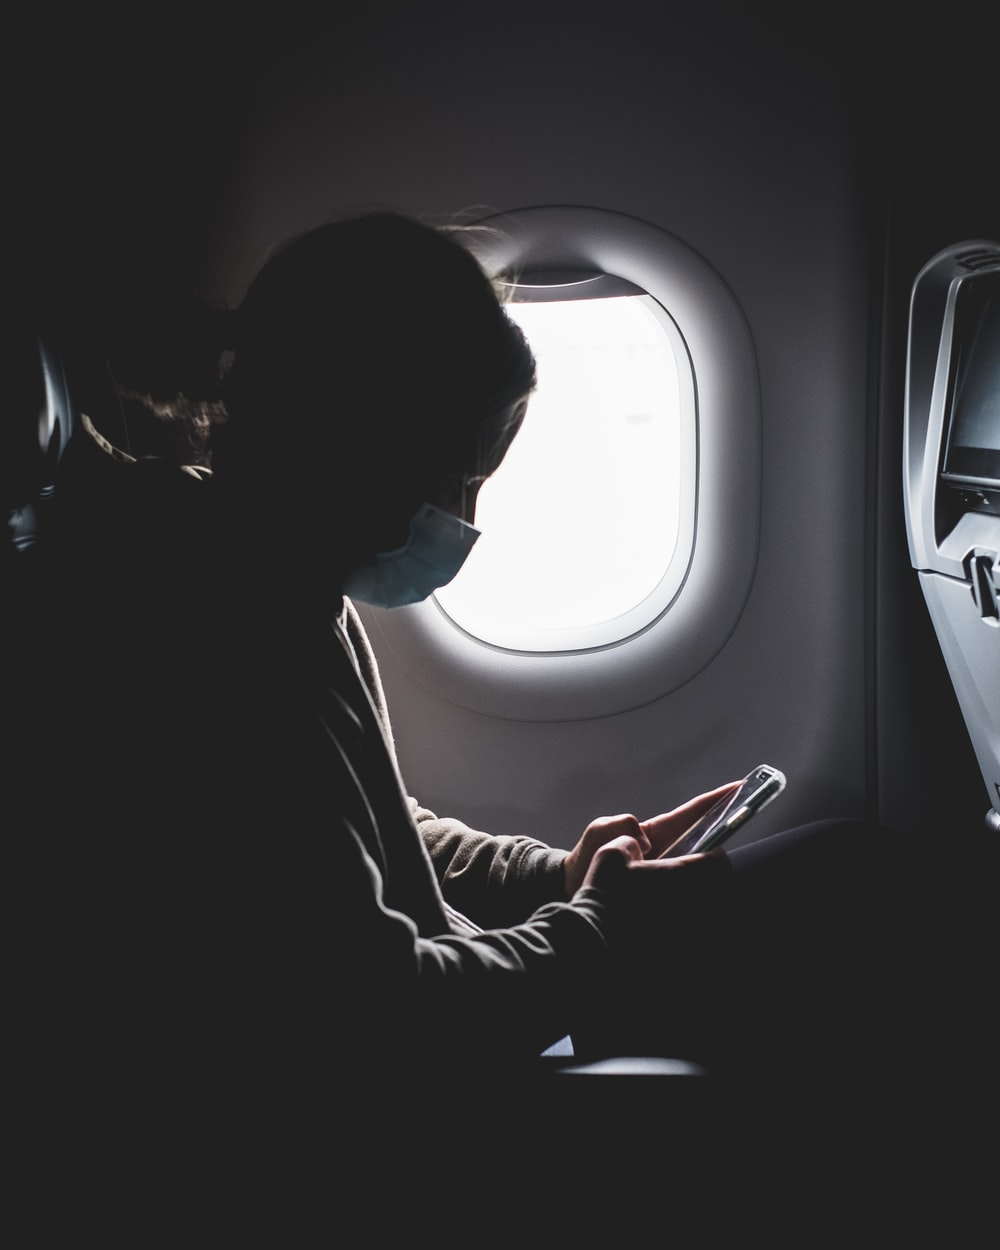 woman in black long sleeve shirt sitting on airplane seat